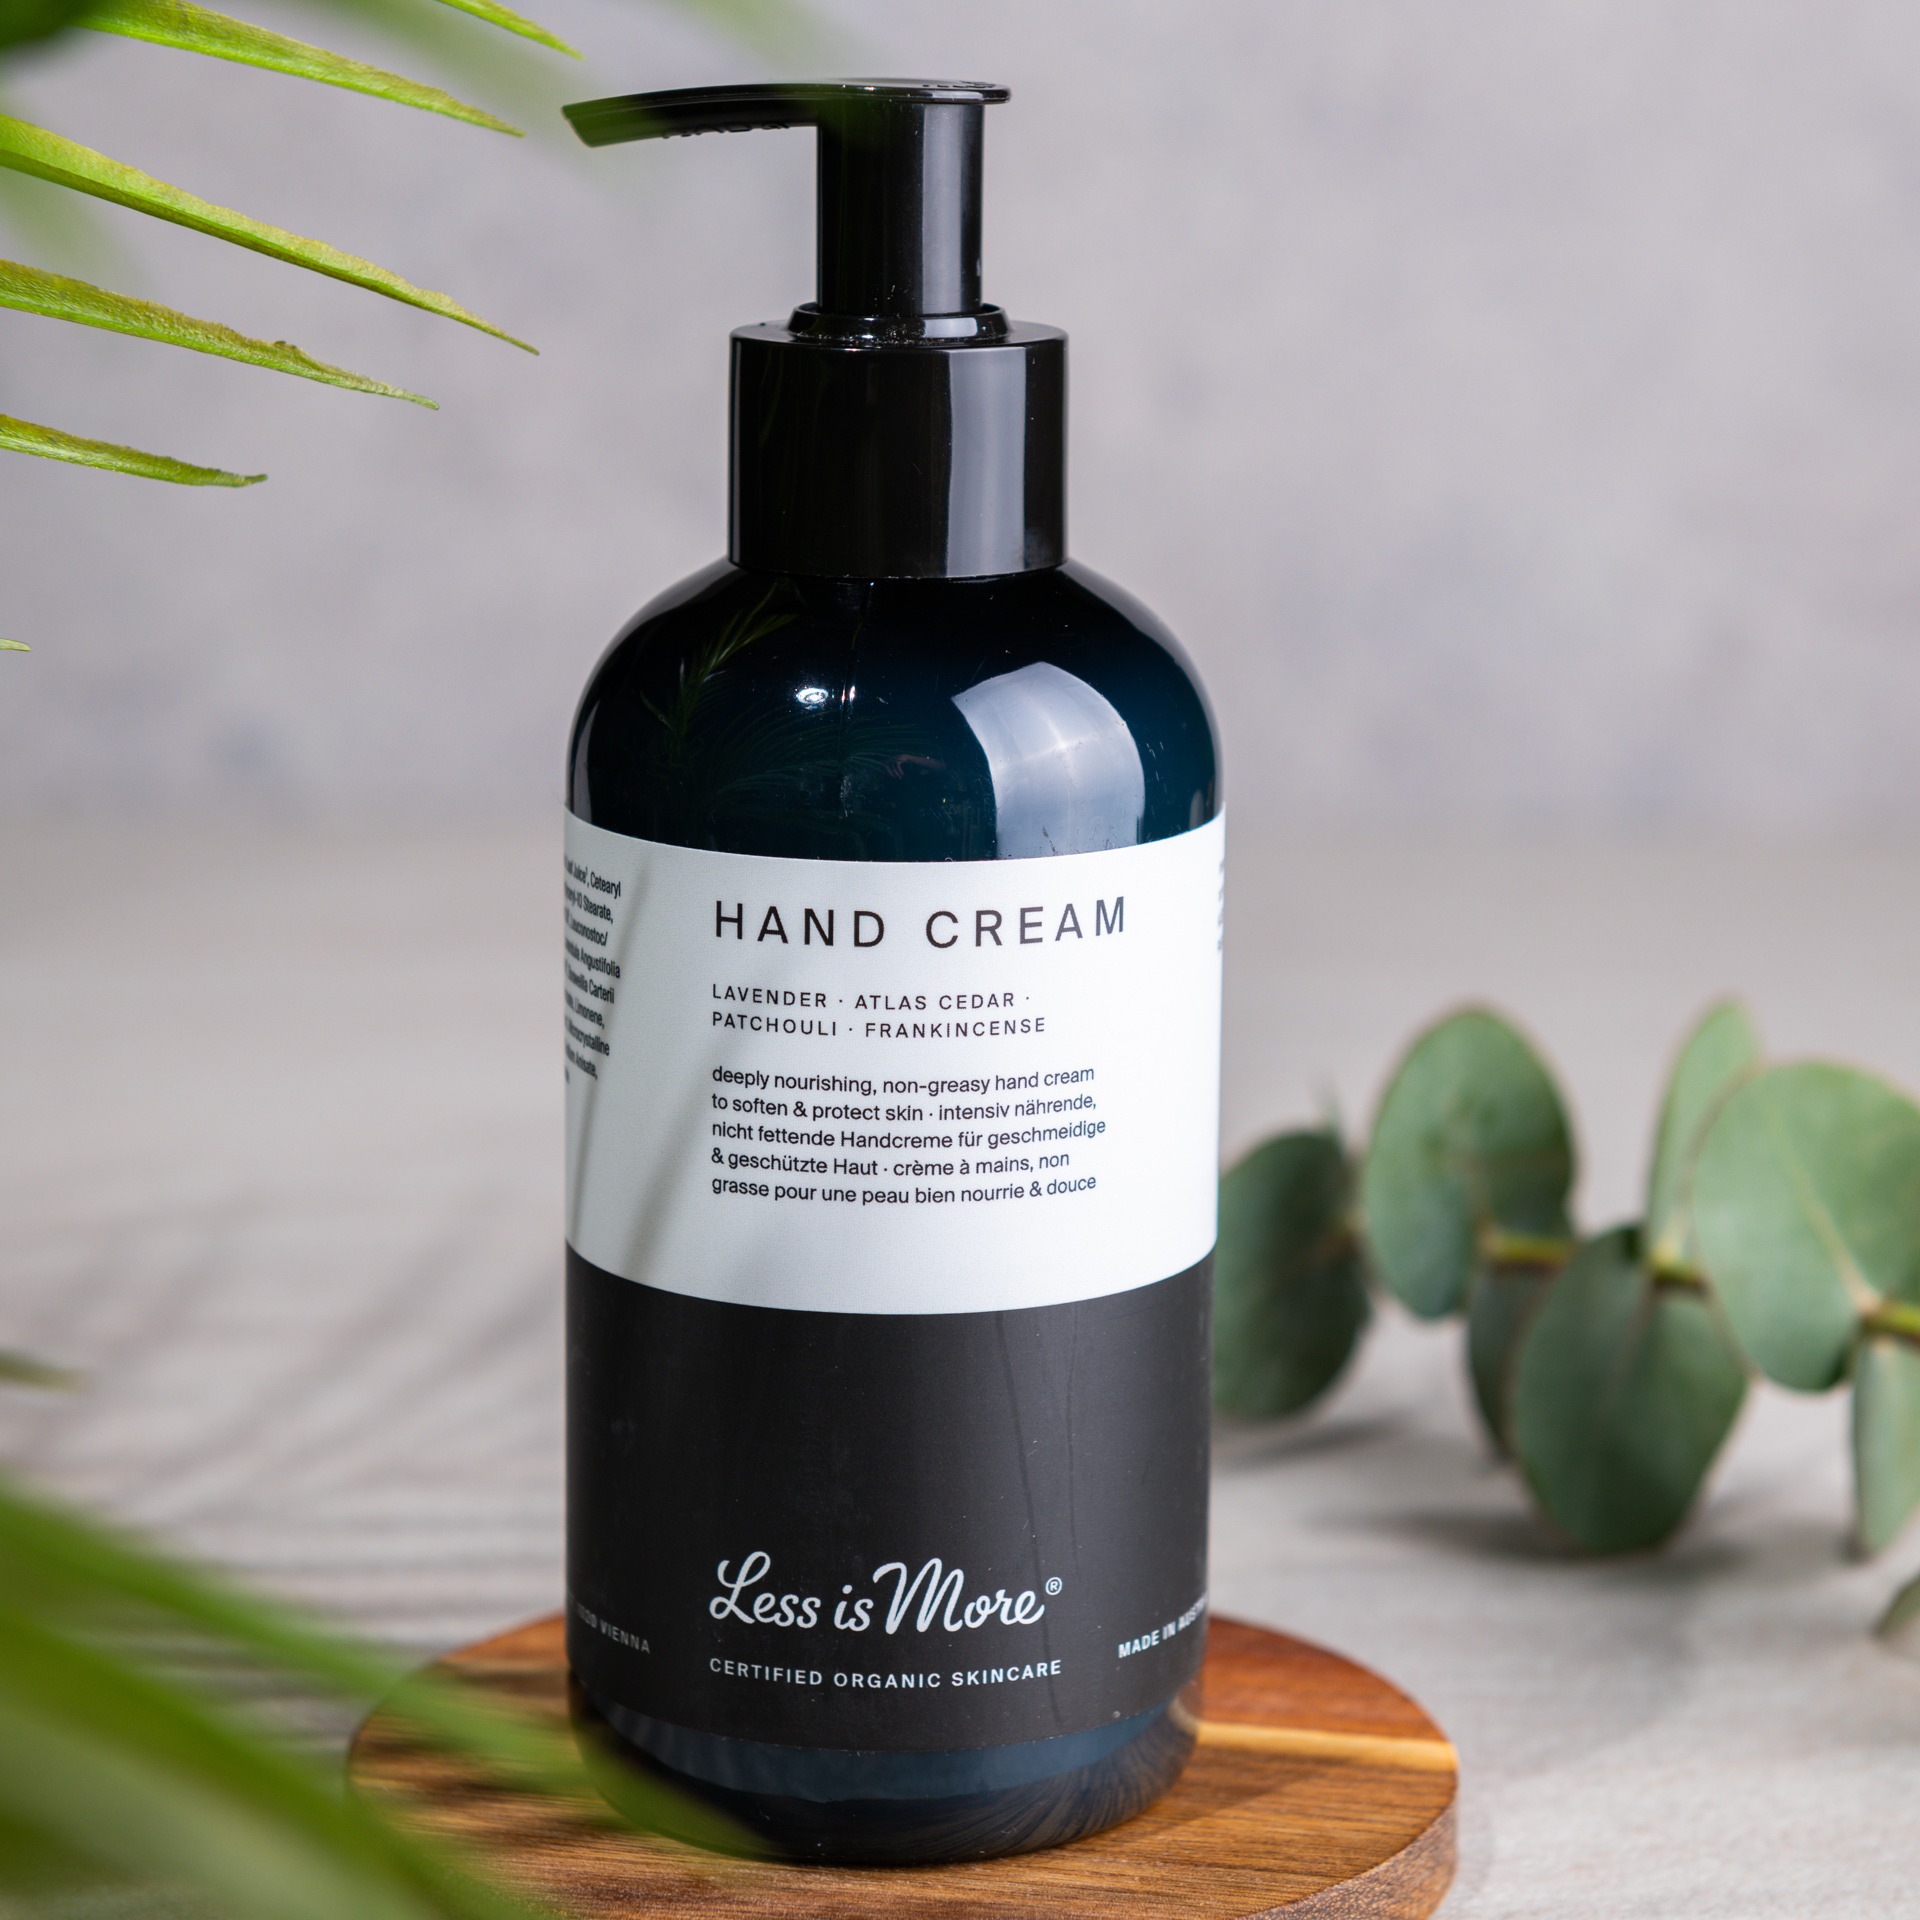 Hand Cream Lavender - Atlas Cedar - Patchouli - Frankincense